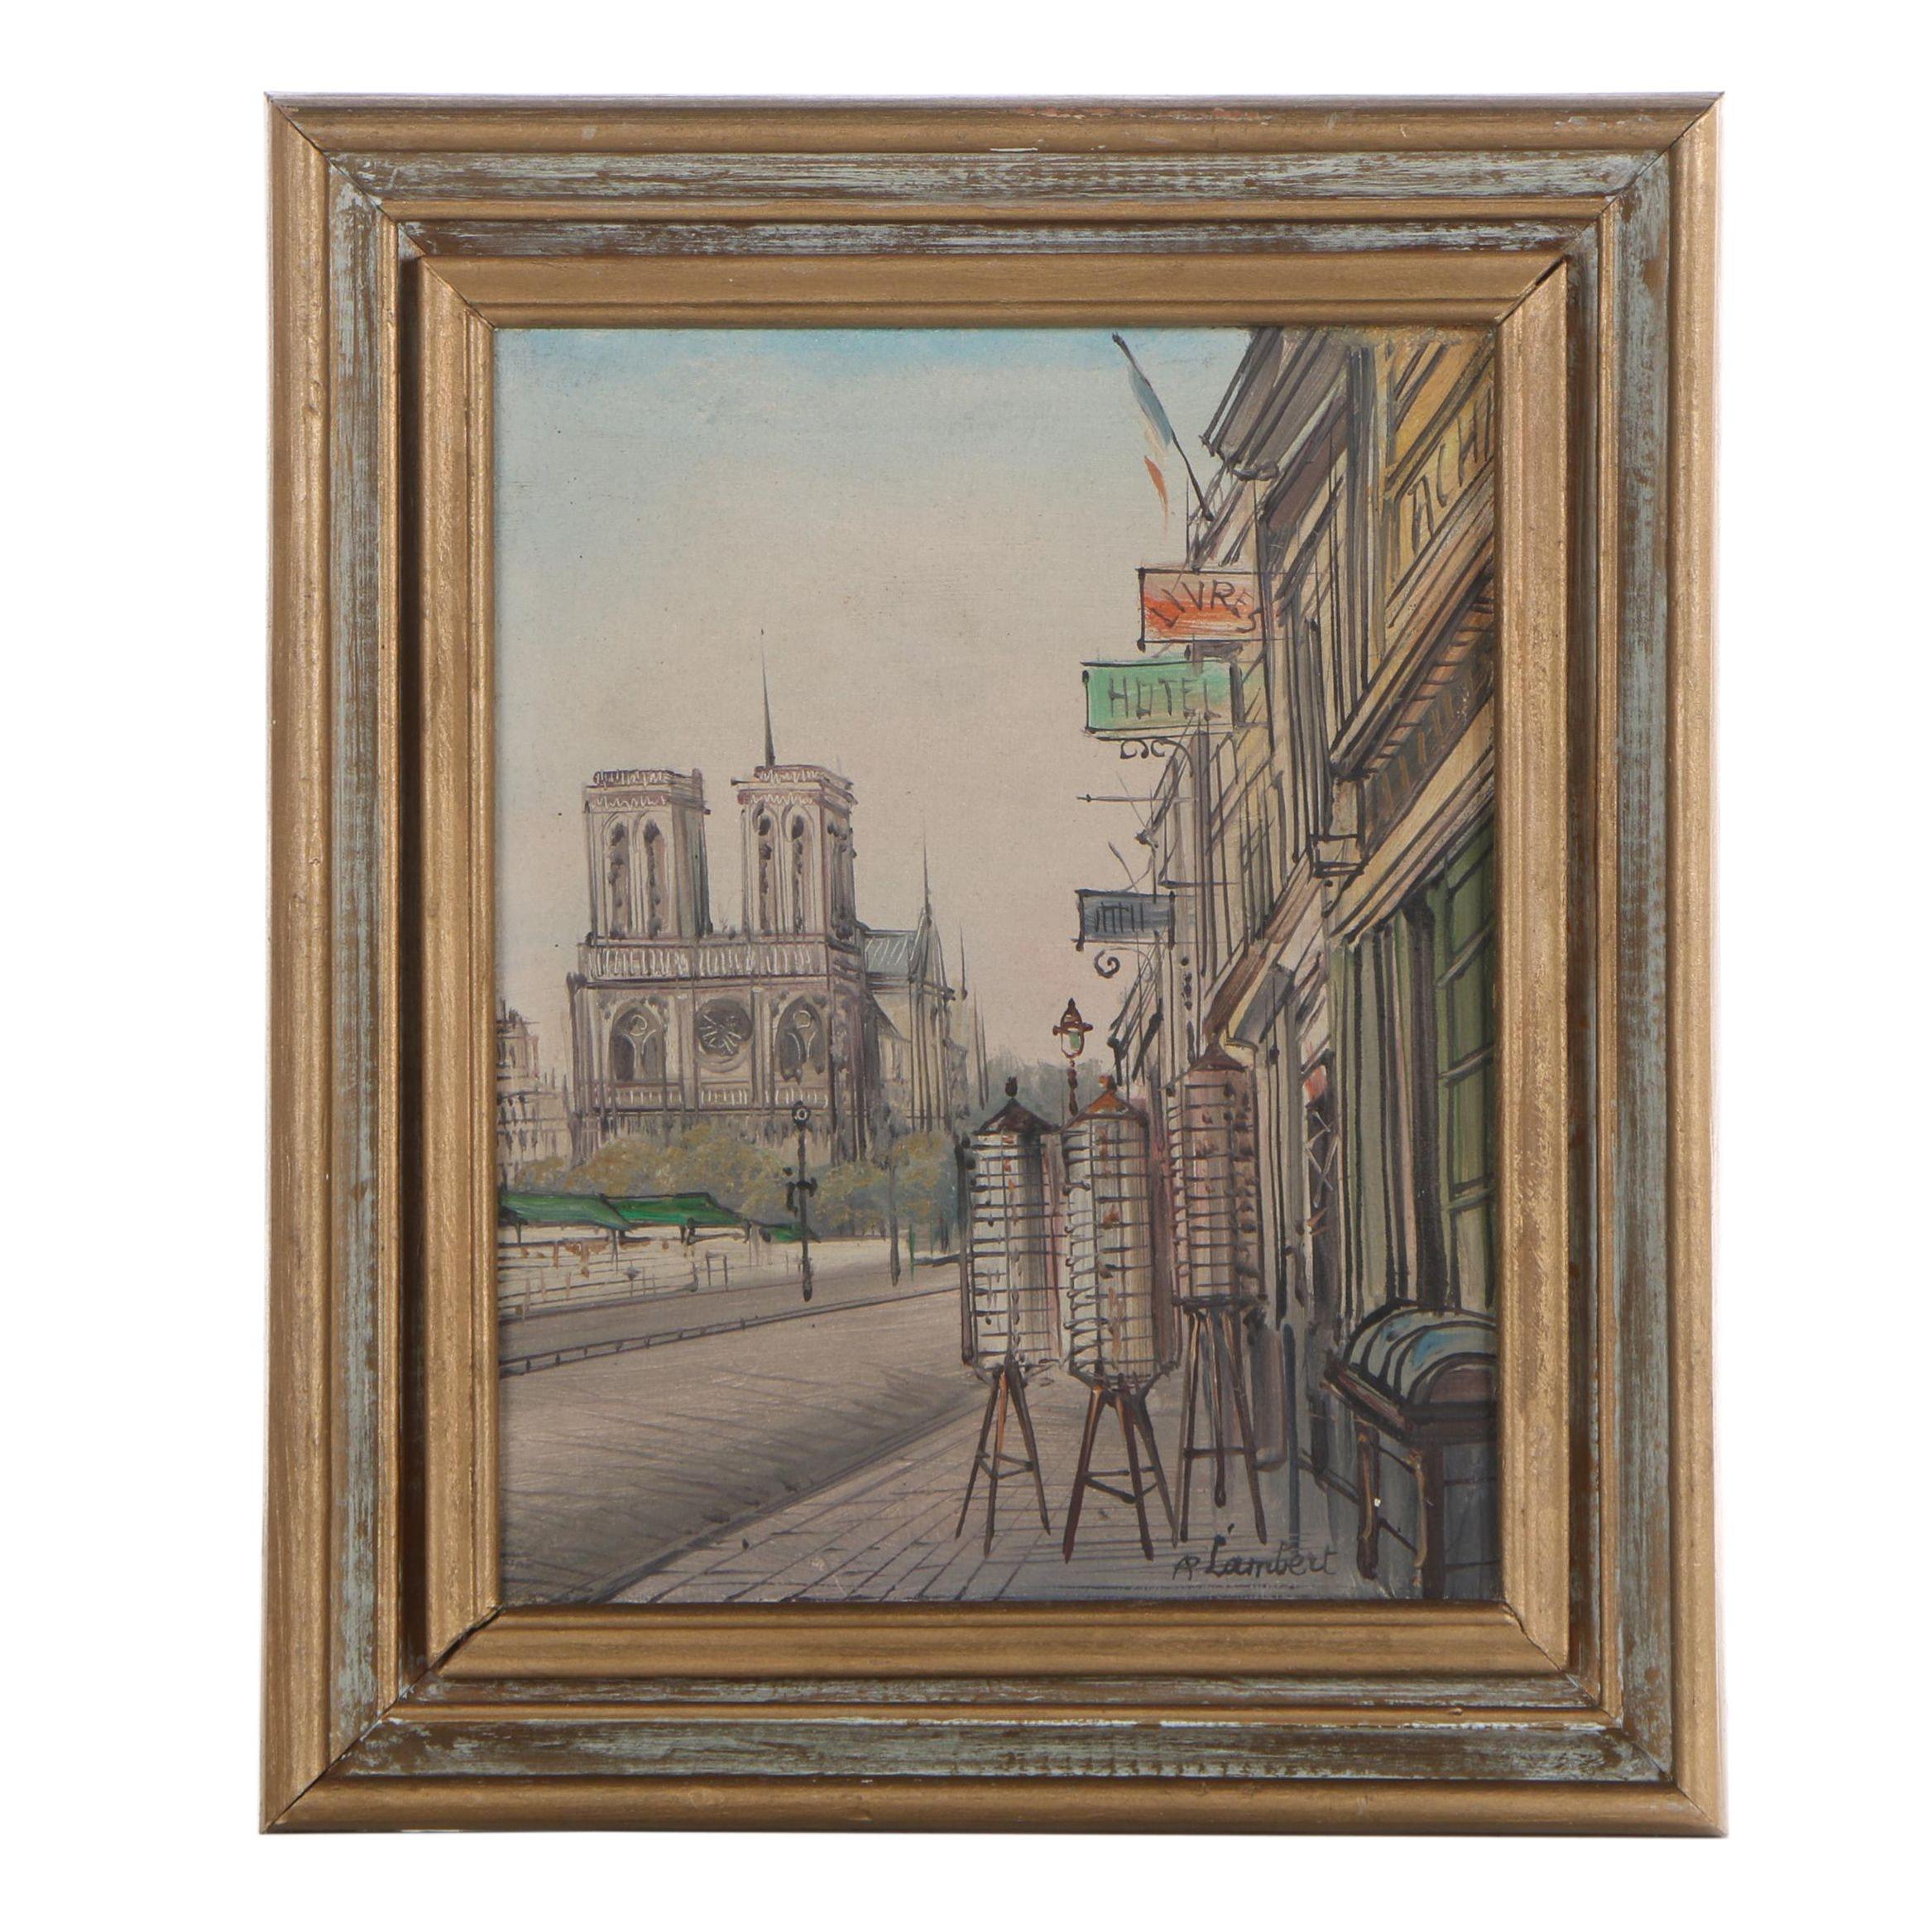 A. Lambert Street View Oil Painting